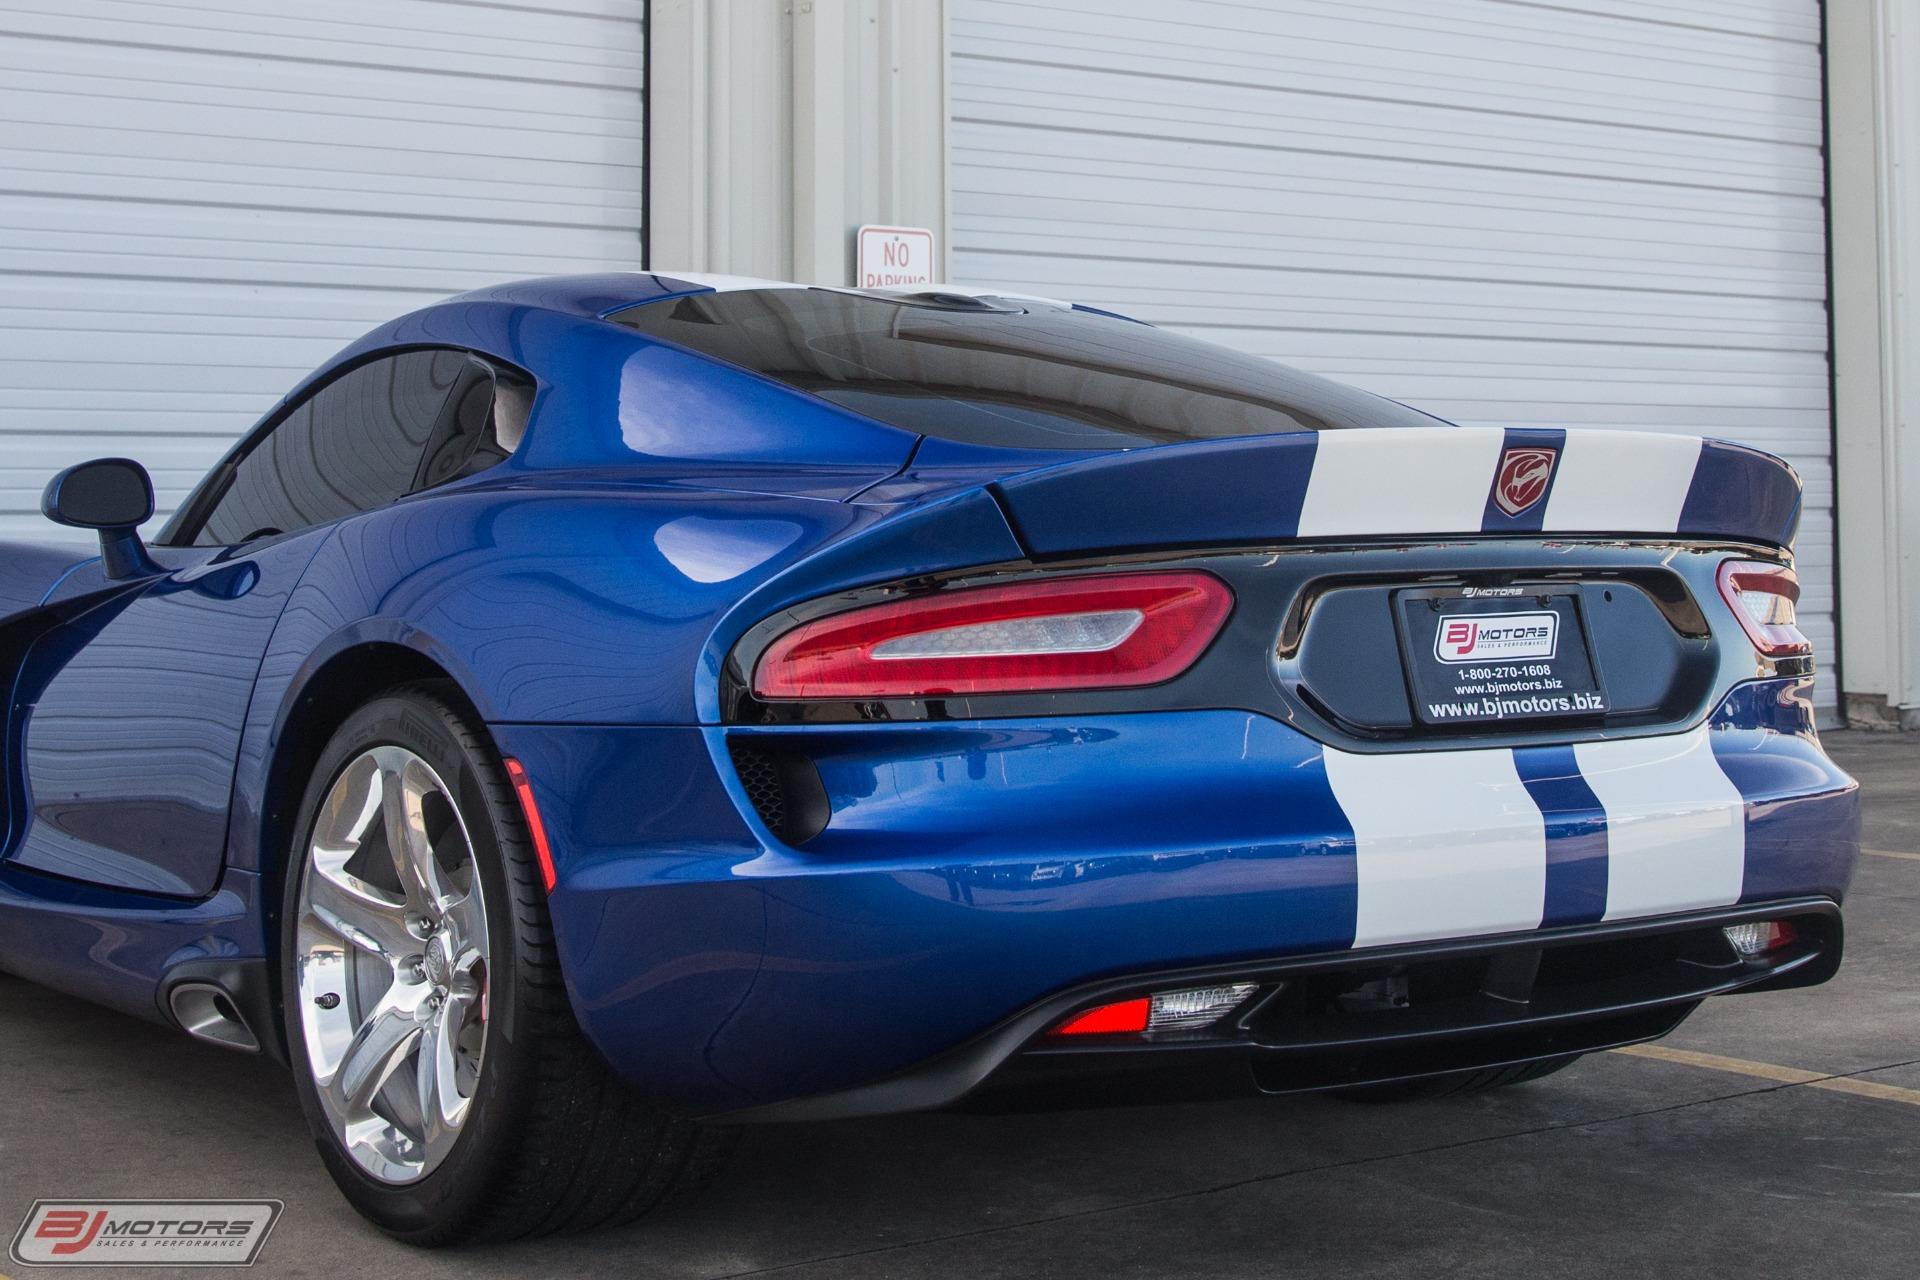 Used-2013-Dodge-SRT-Viper-GTS-Launch-Edition